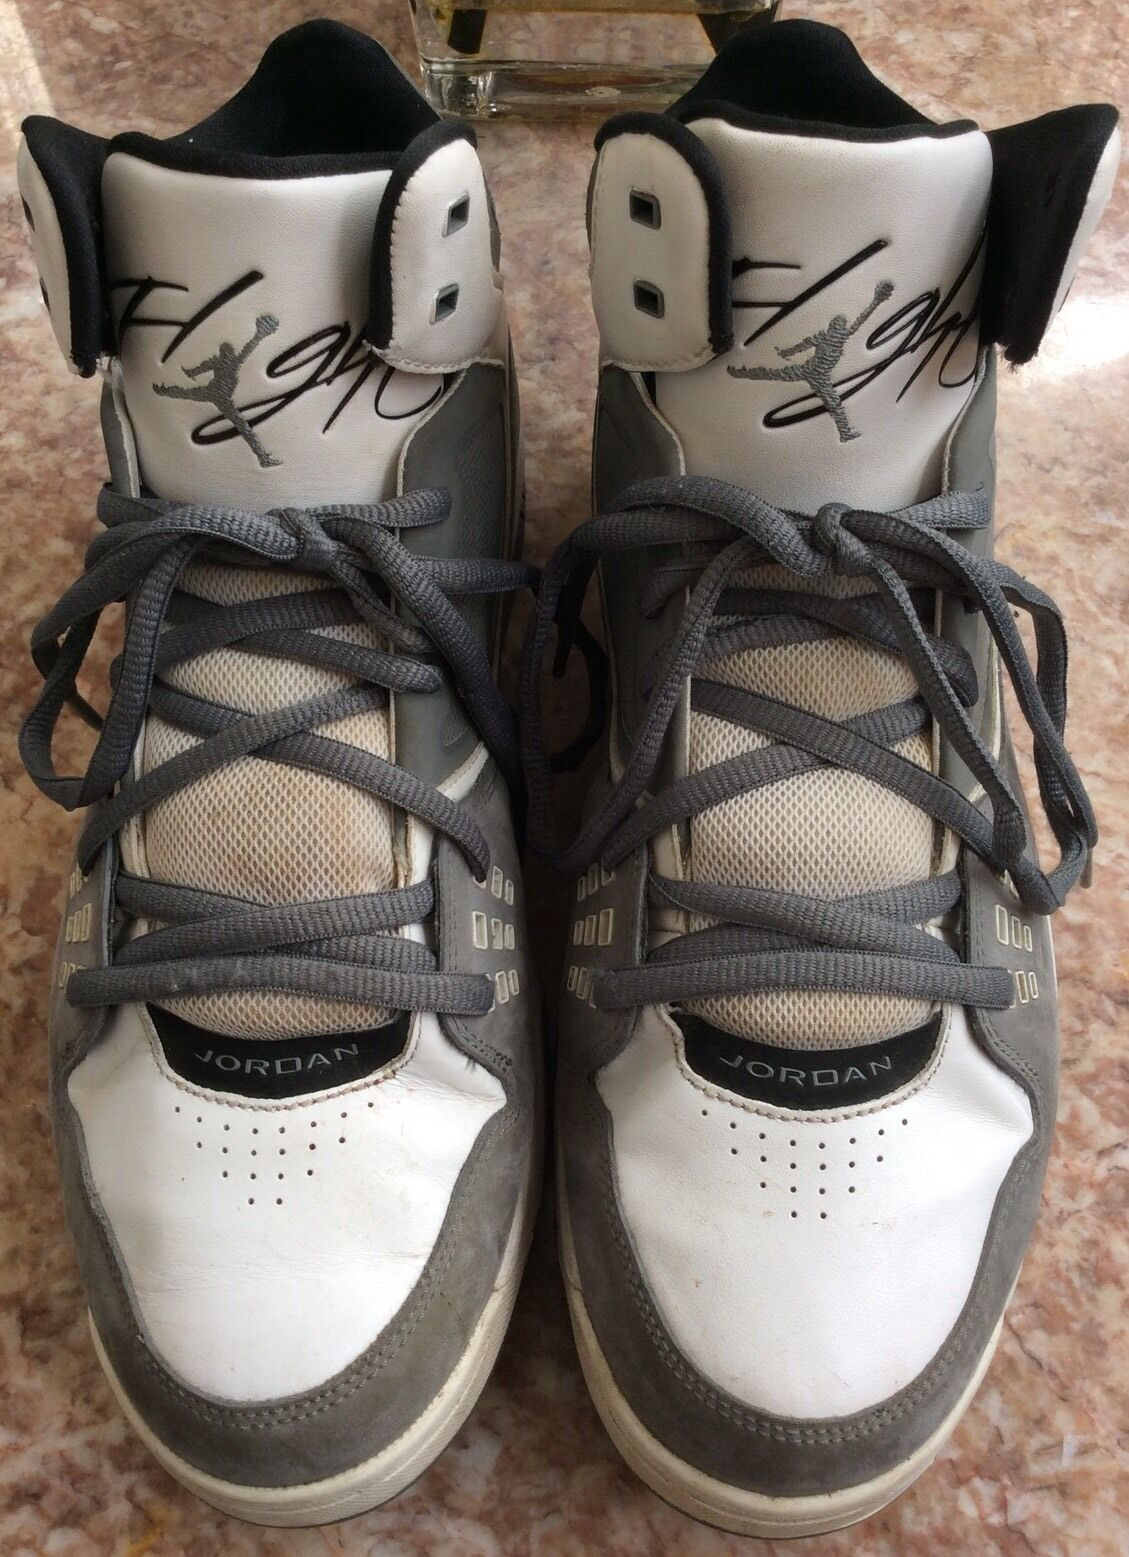 2972ccbb278 ... NIKE Air Jordan Flight 23 RST Men's Gray White White White Basketball  Shoes Sz12 e742b4 ...